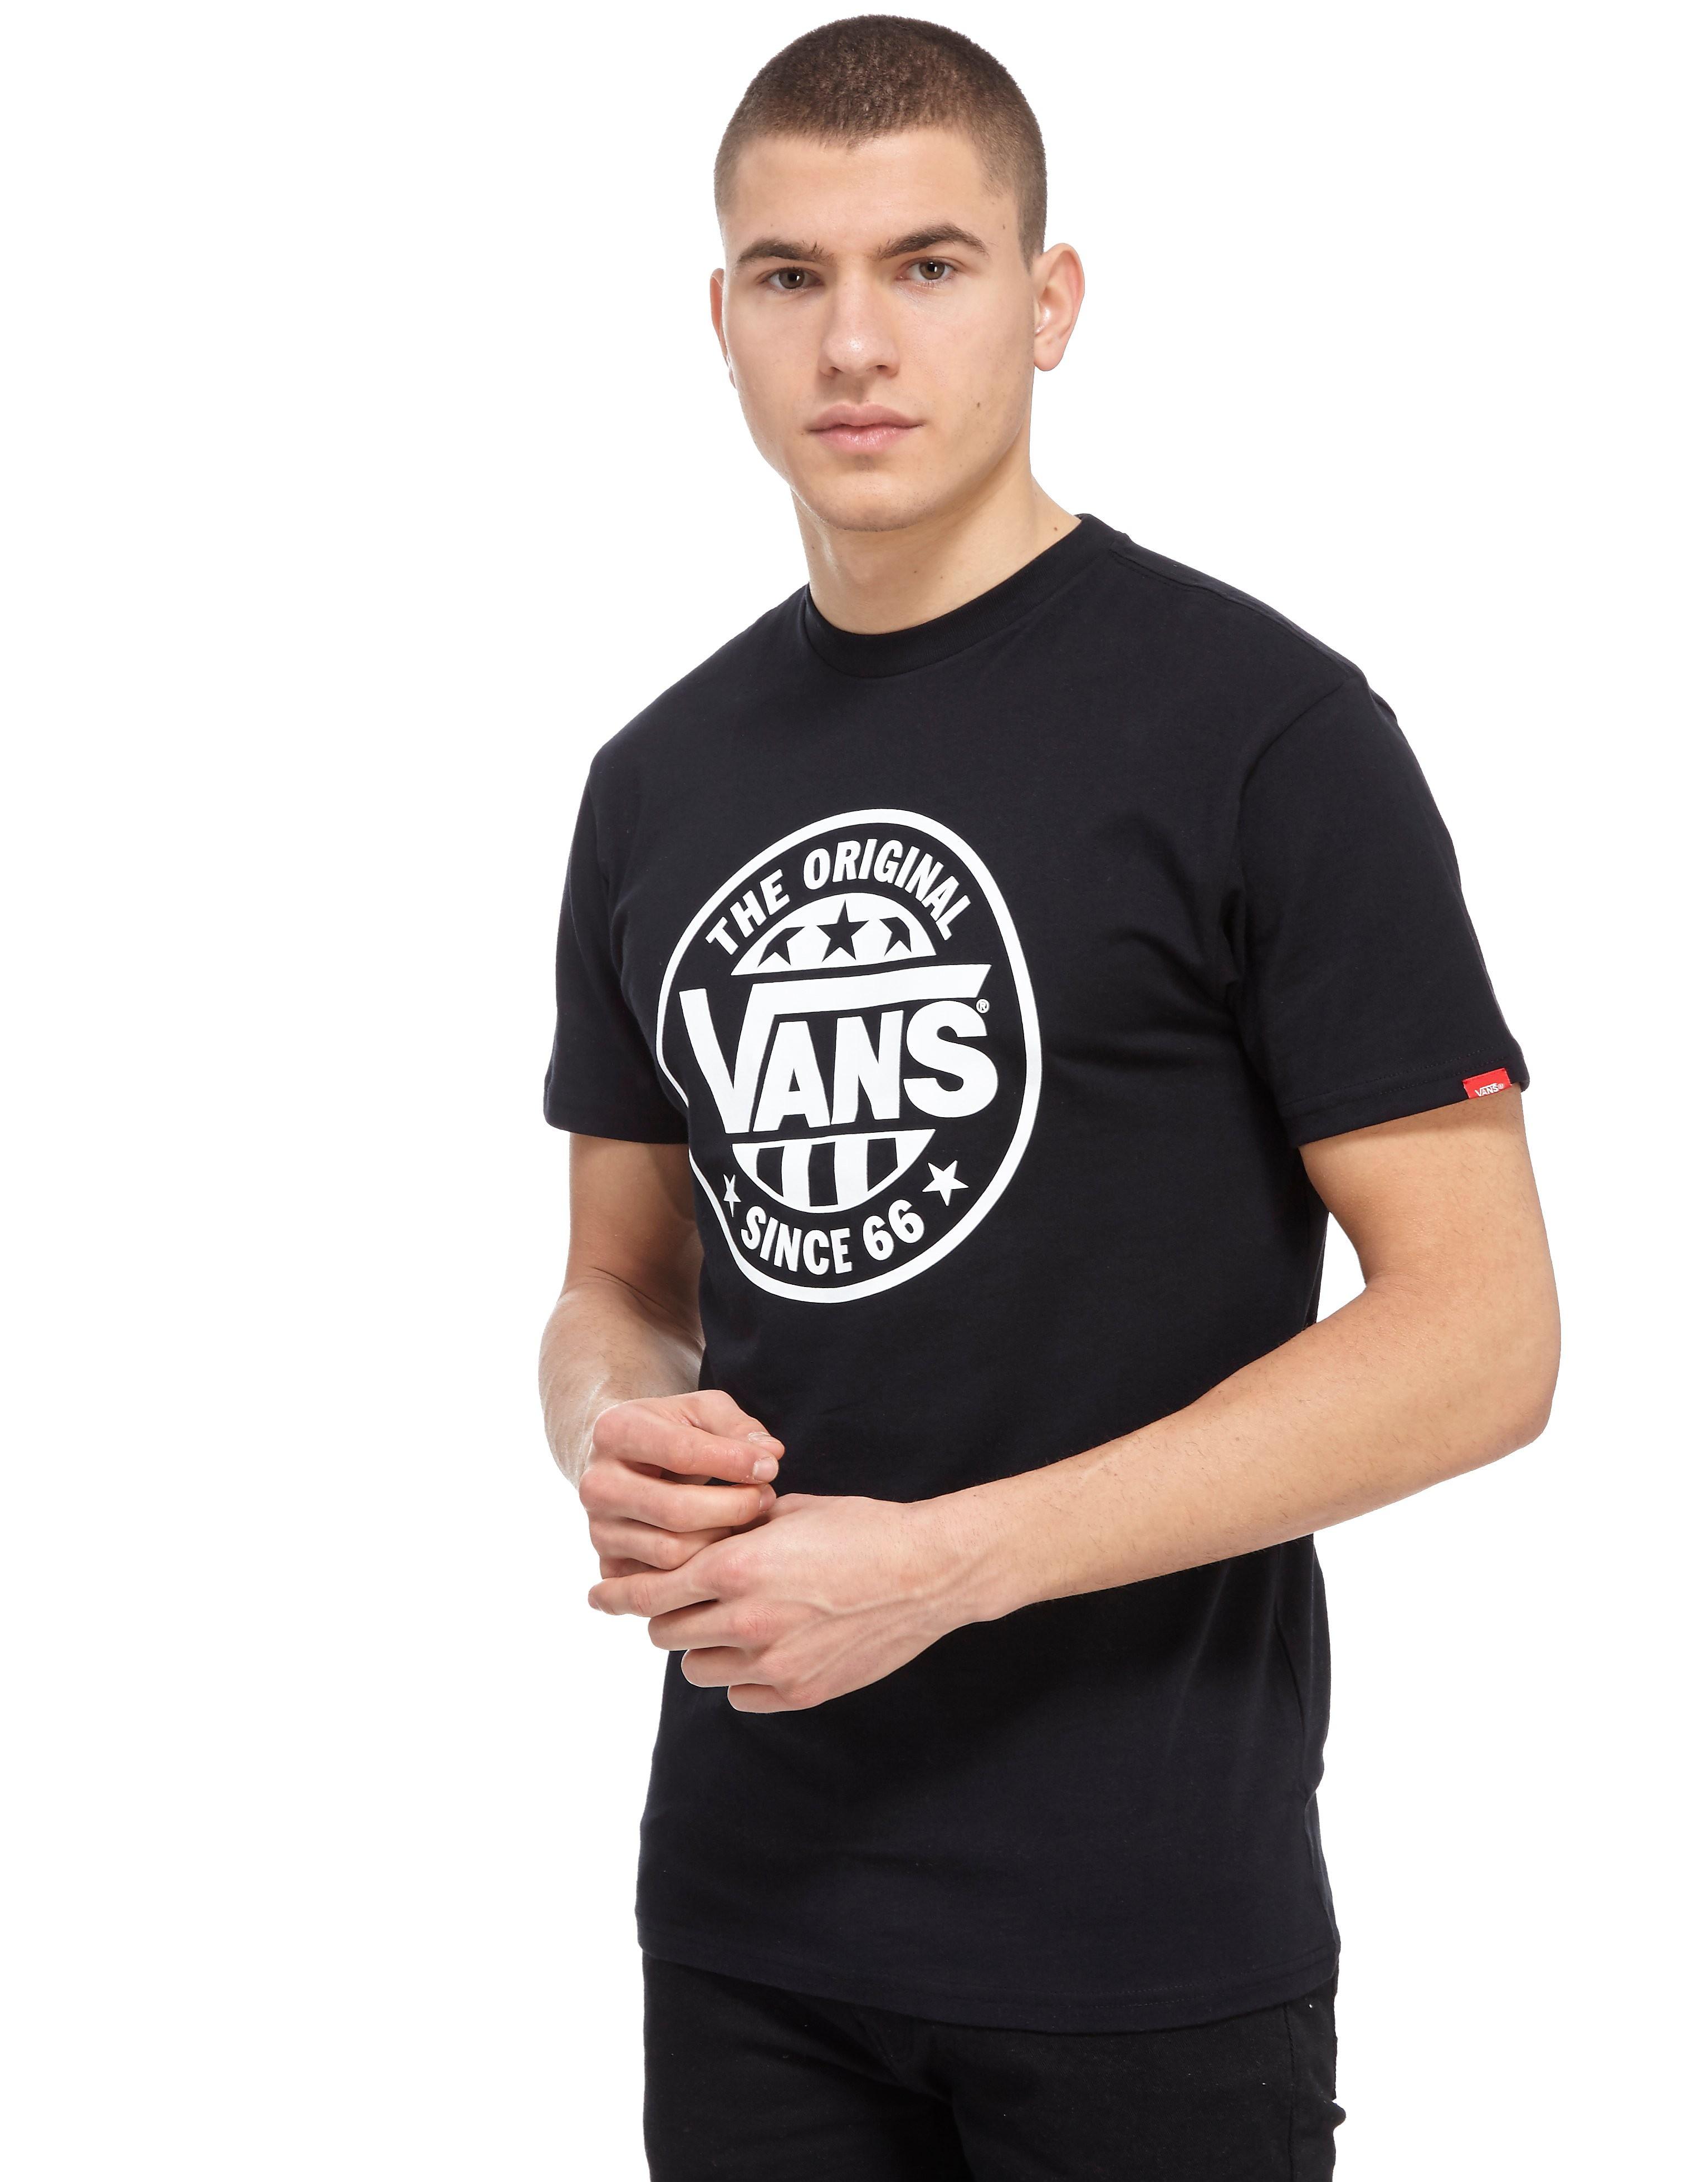 Vans Original 66 T-Shirt